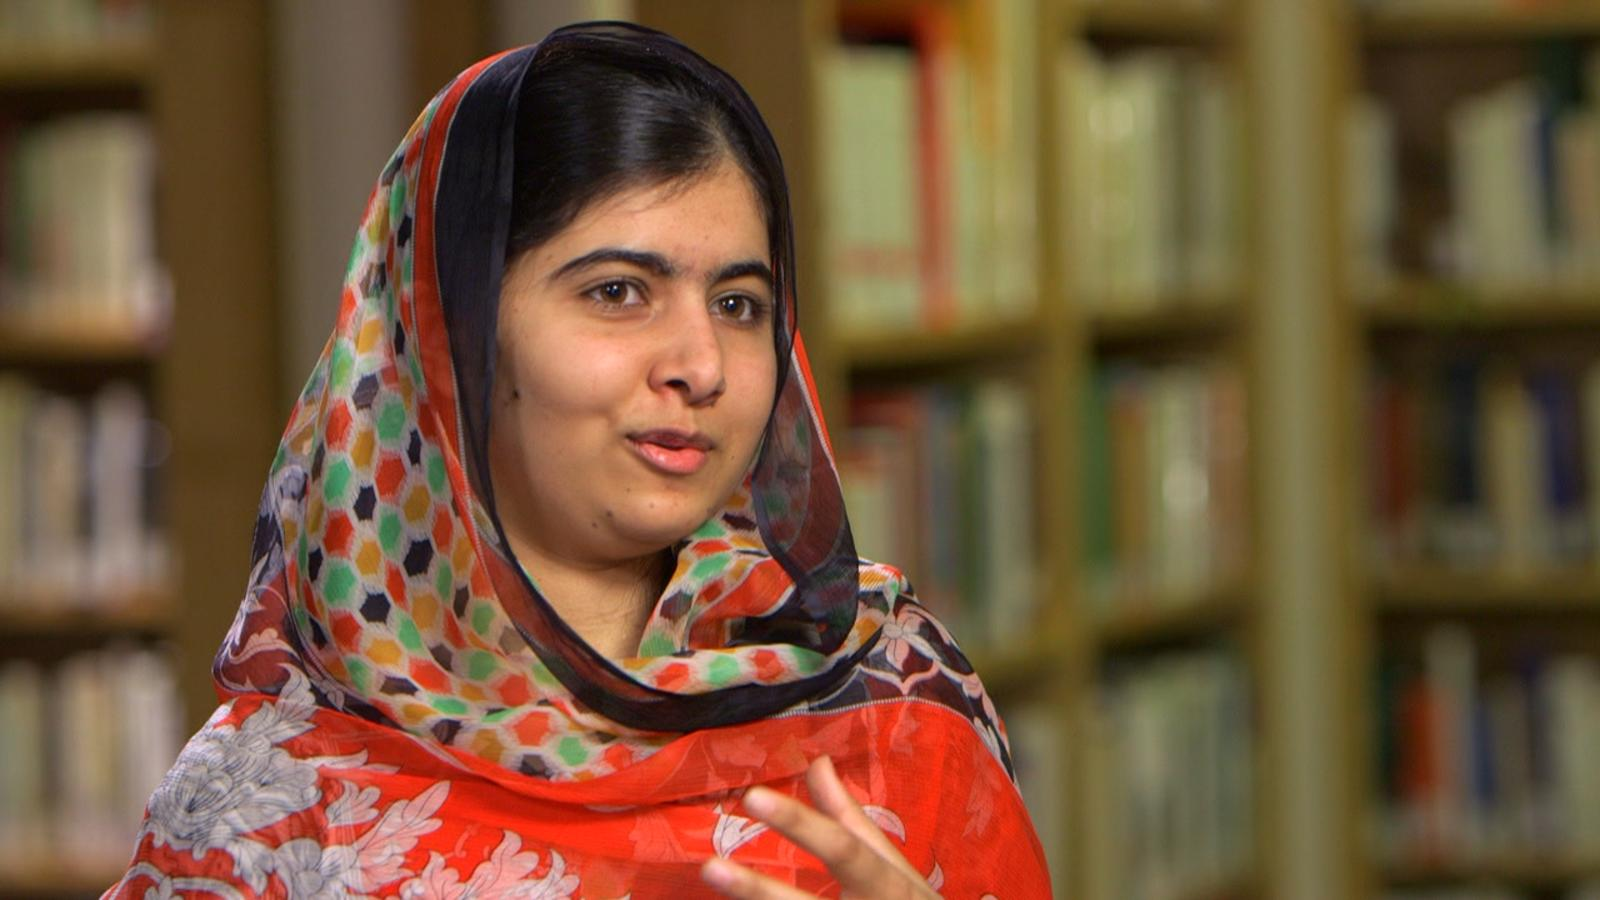 Malala Yousafzai Wallpaper 18   1600 X 900 stmednet 1600x900